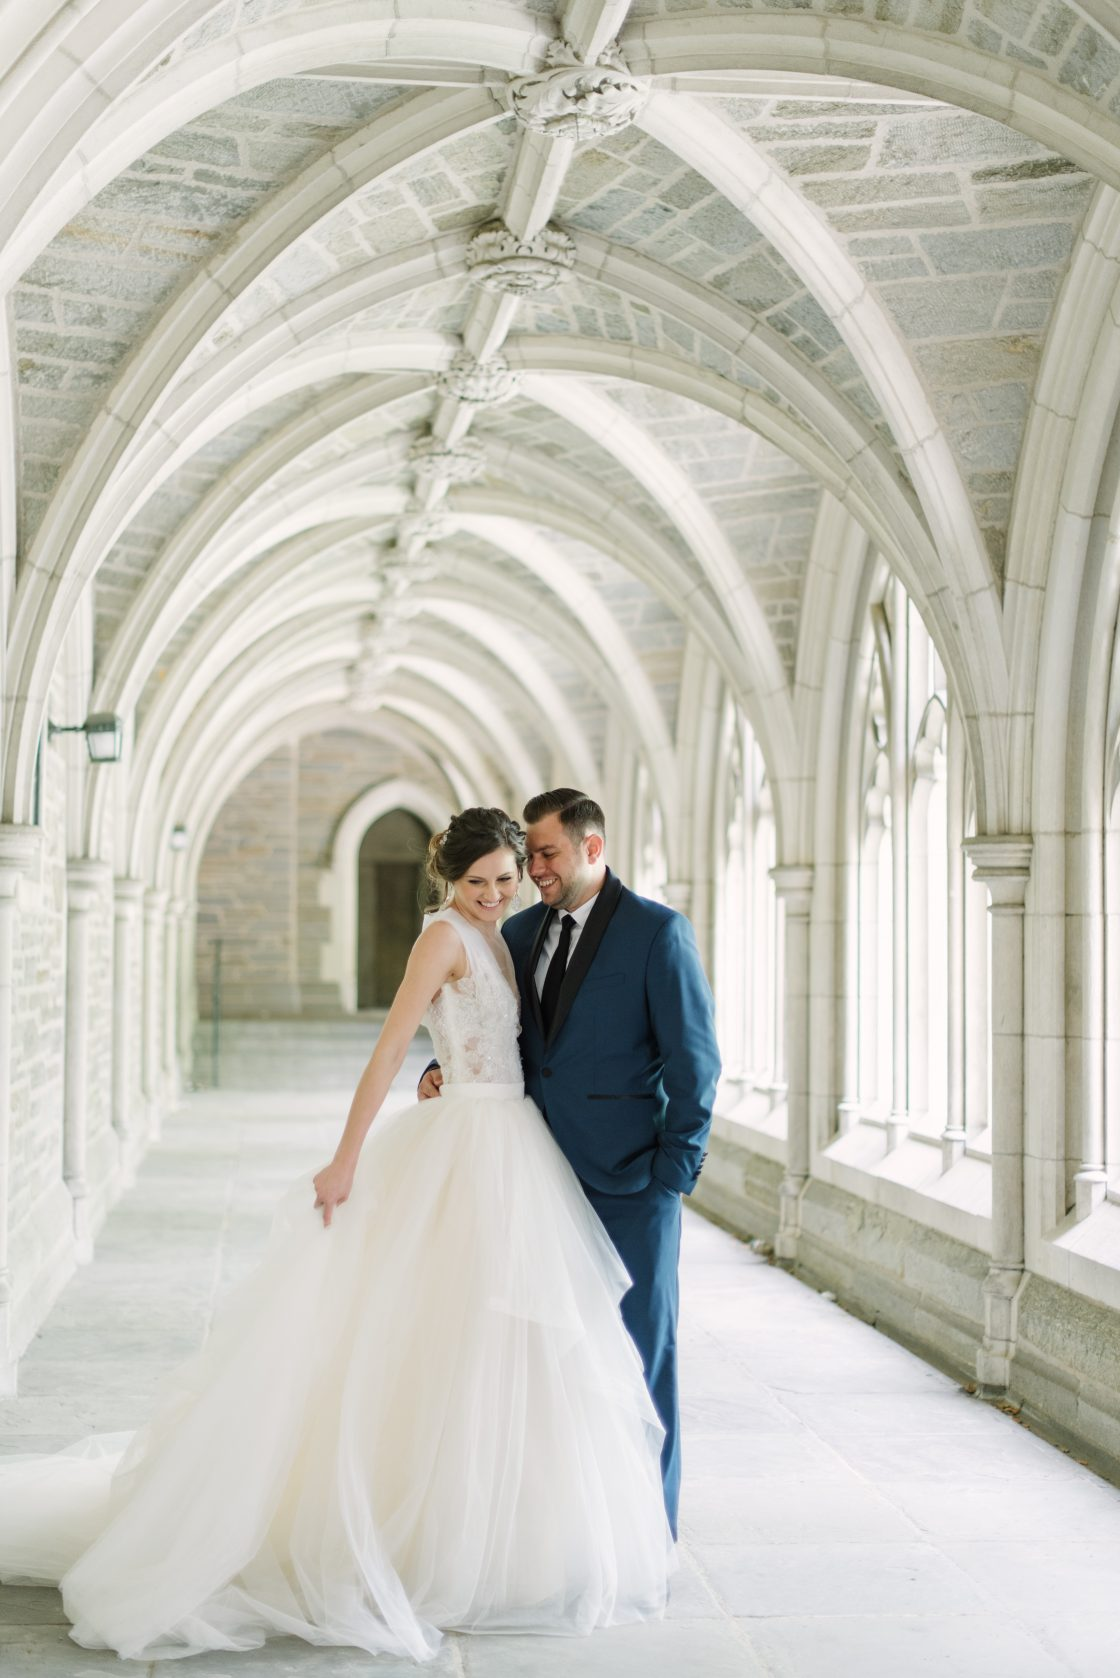 Romantic Candid Wedding Portrait